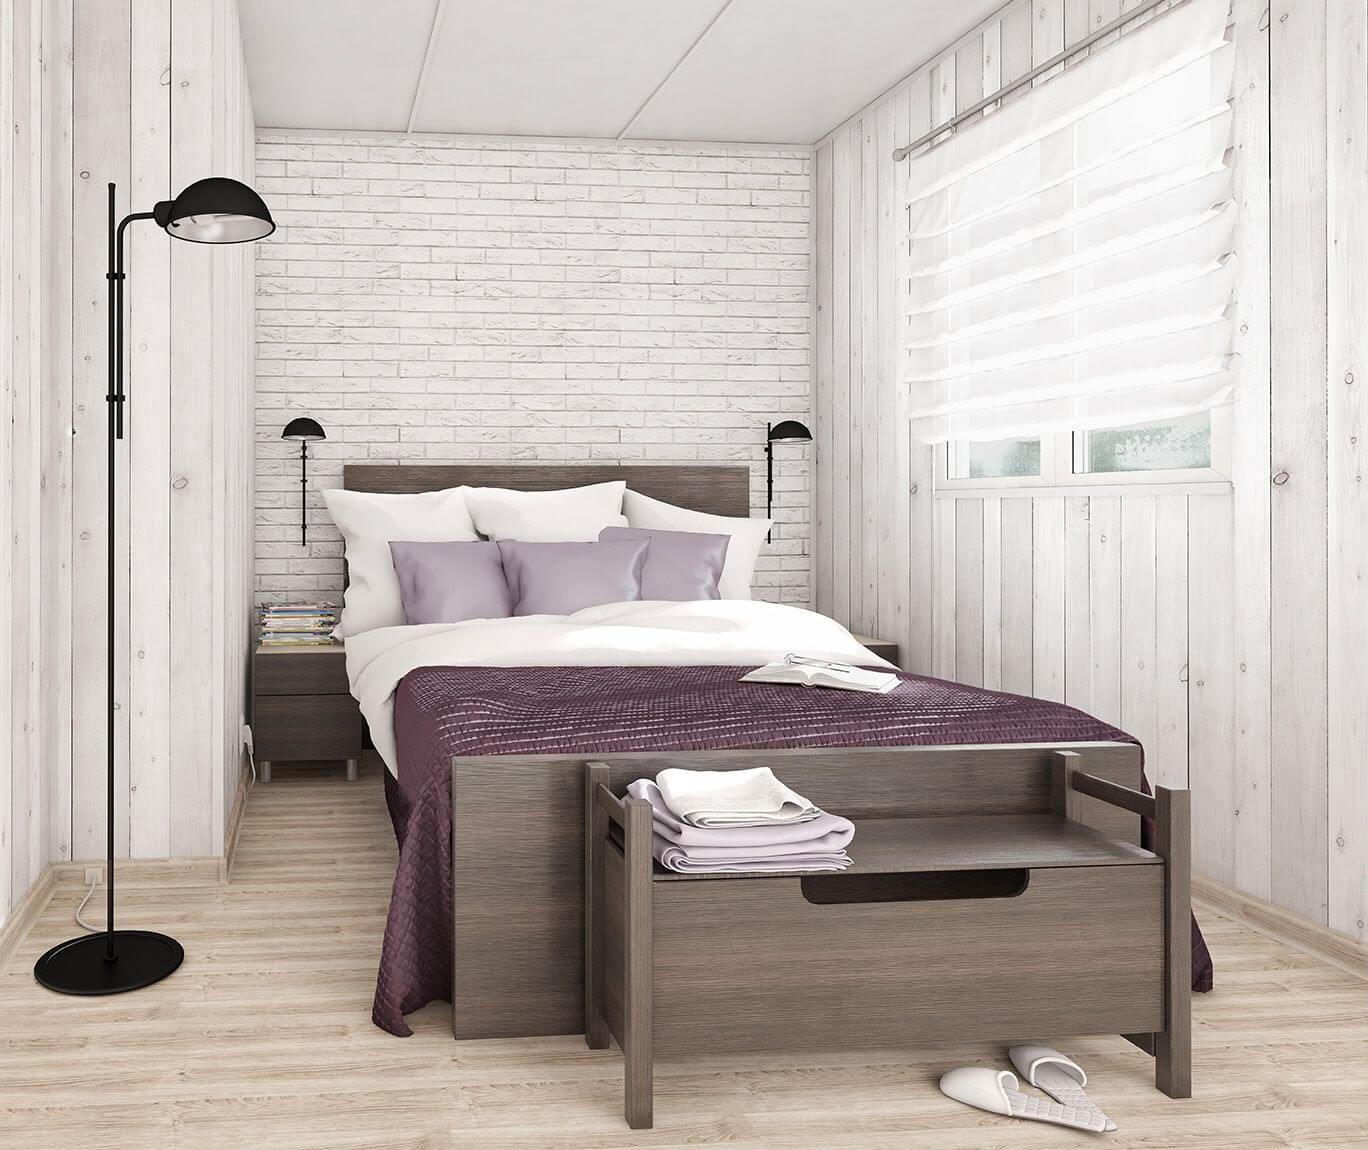 Bedroom Sets For Girls White Brick Wallpaper Bedroom Rectangular Bedroom Design Ideas Kids Bedroom Cupboard Designs: White Brick Tile Cladding